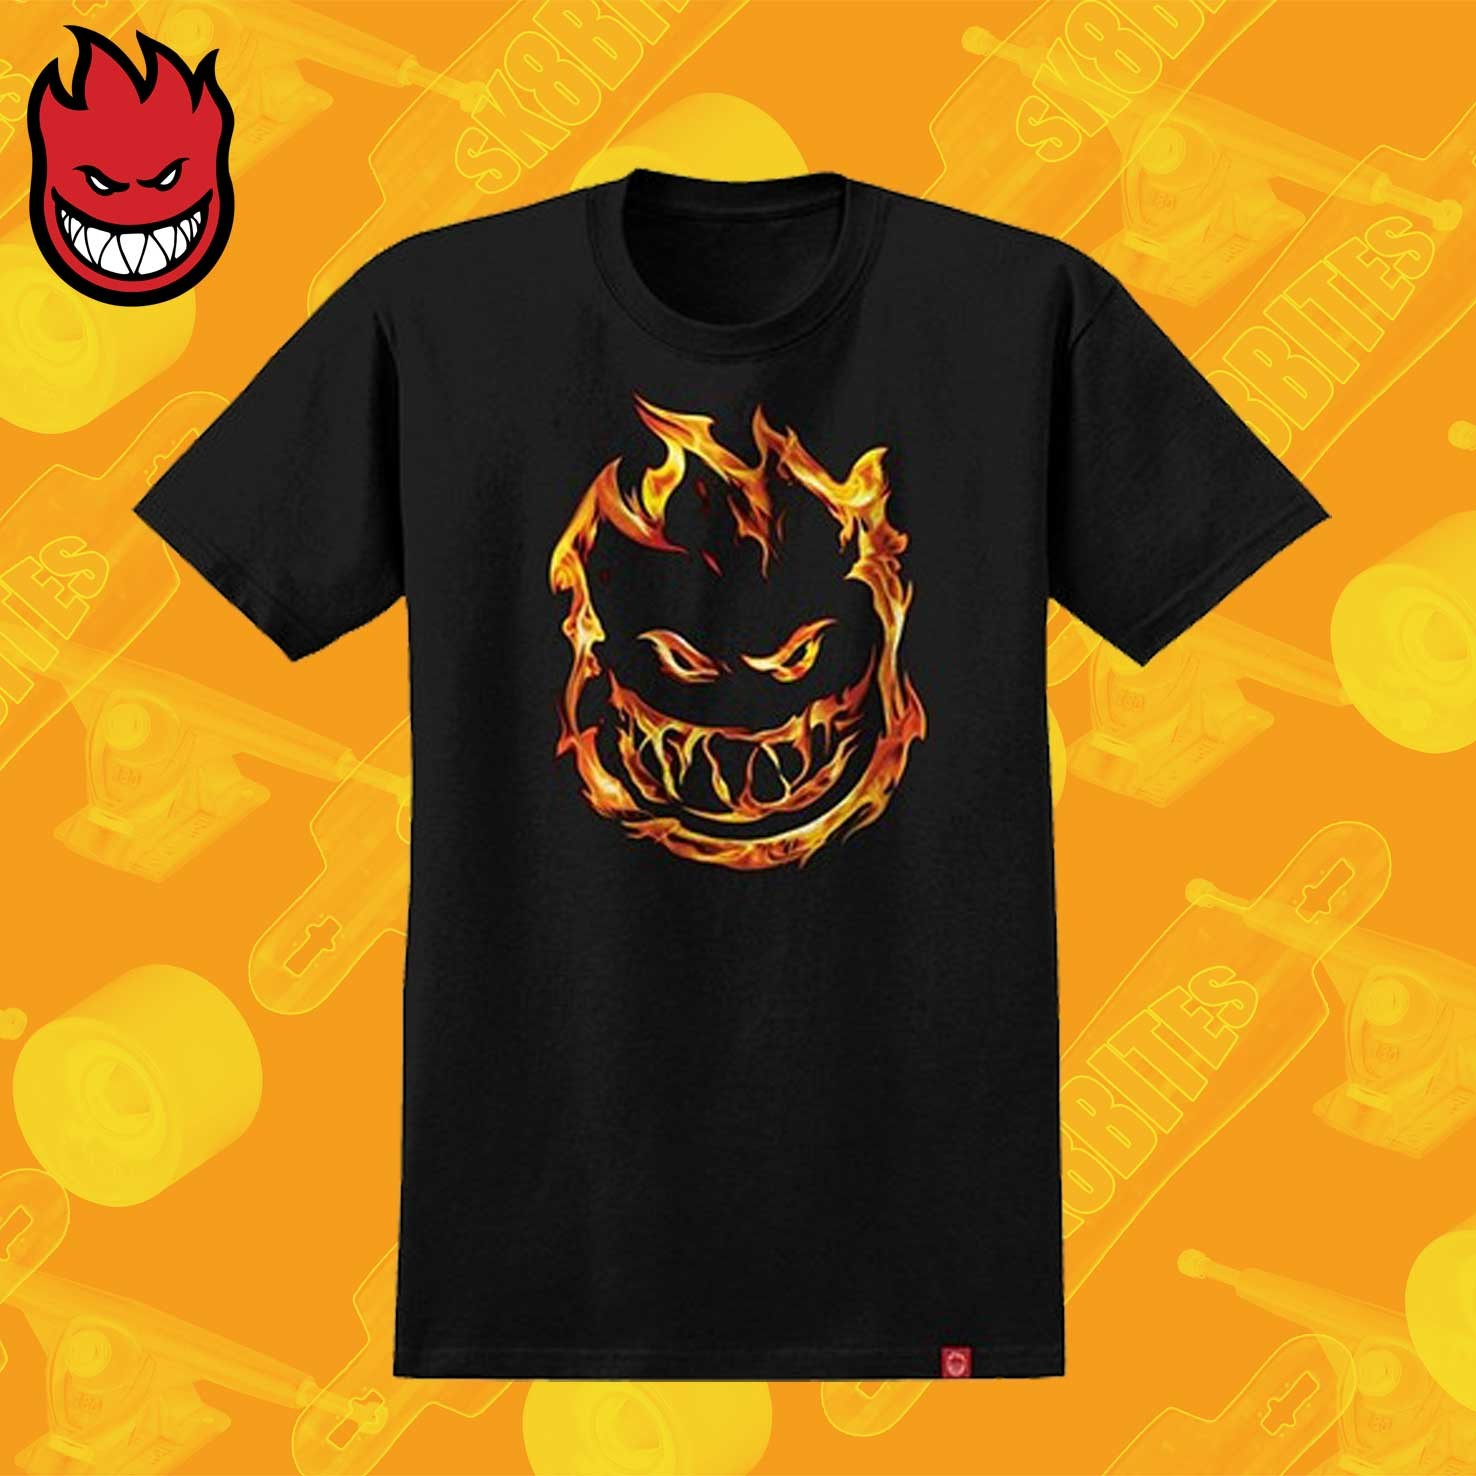 Maglietta Shirt Spitfire T 451 Unisex Skateboard Premium Streetwear vm0y8PwNnO